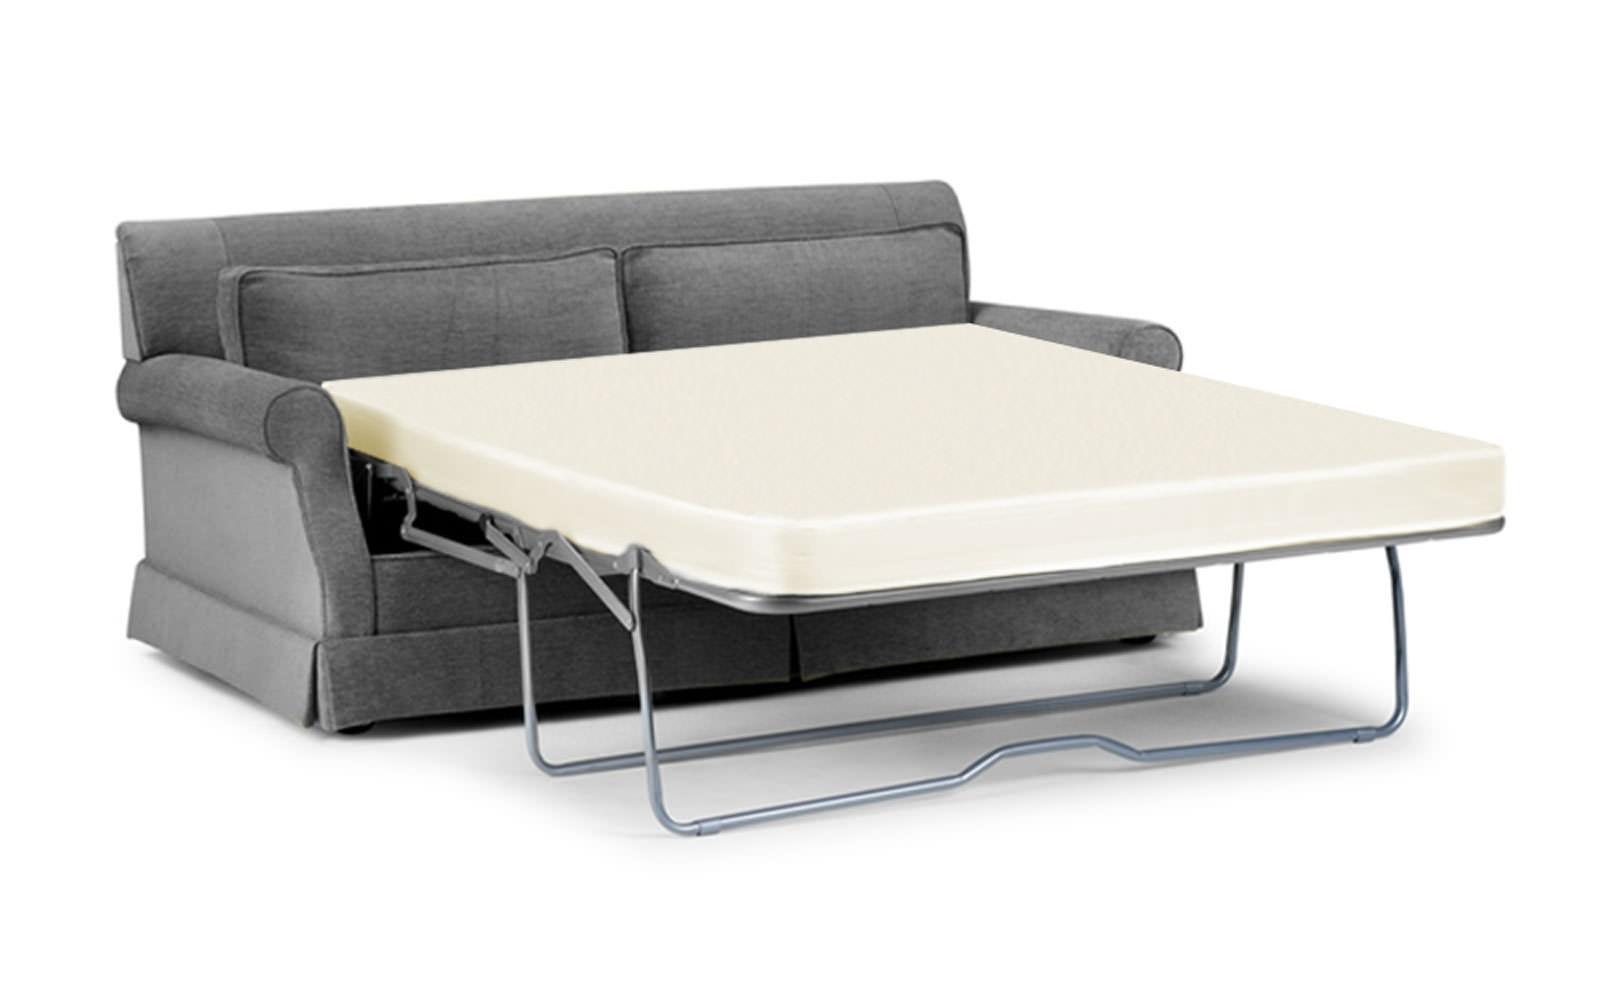 Sofas Center : Beddinge Sleeper Sofa Comfort Cloud Mattress Pad In Sleeper Sofas Mattress Covers (View 8 of 20)